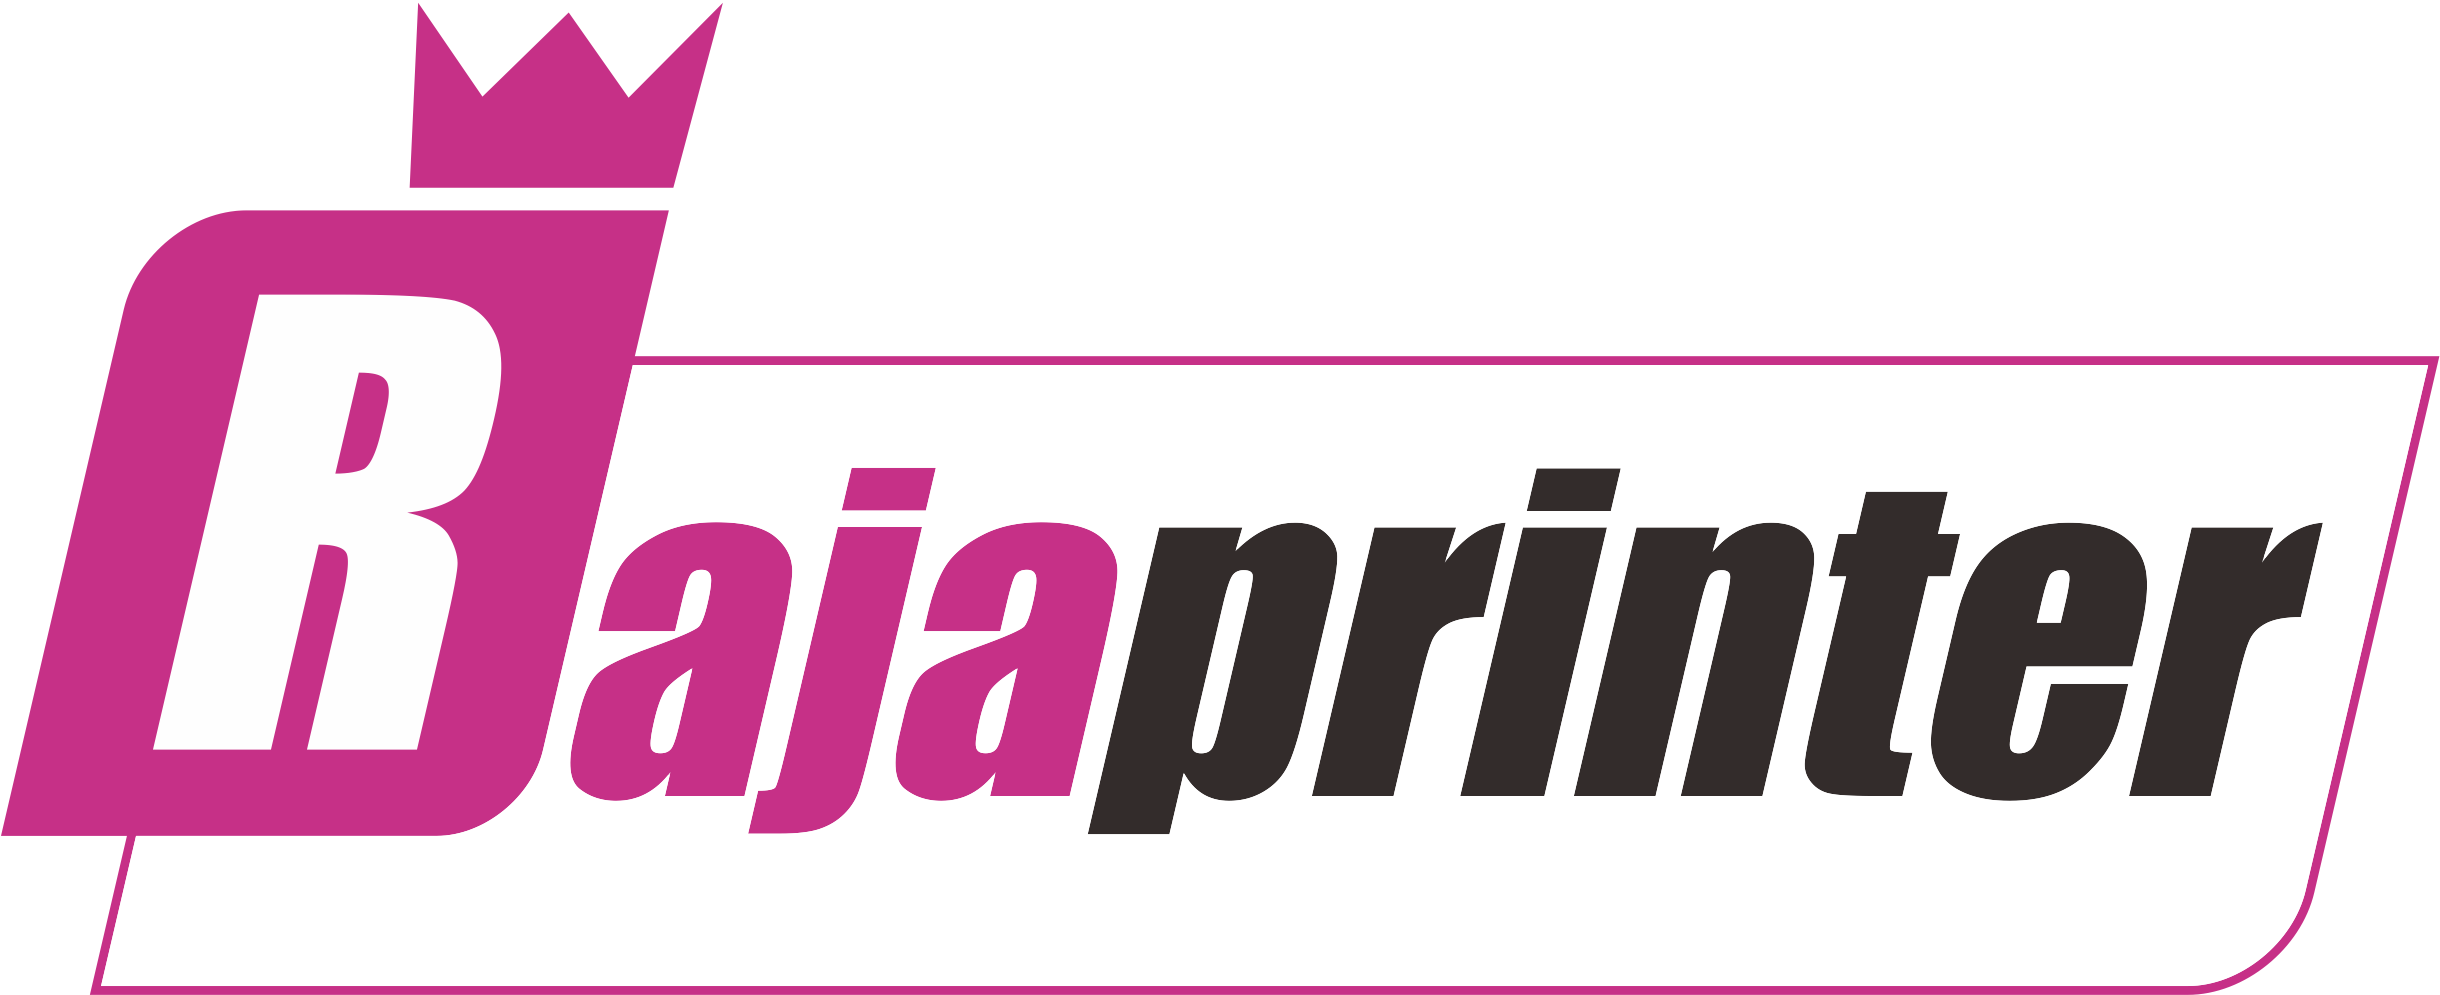 Rental Sewa Jual Printer Mesin Fotocopy Murah No. 1 Jakarta